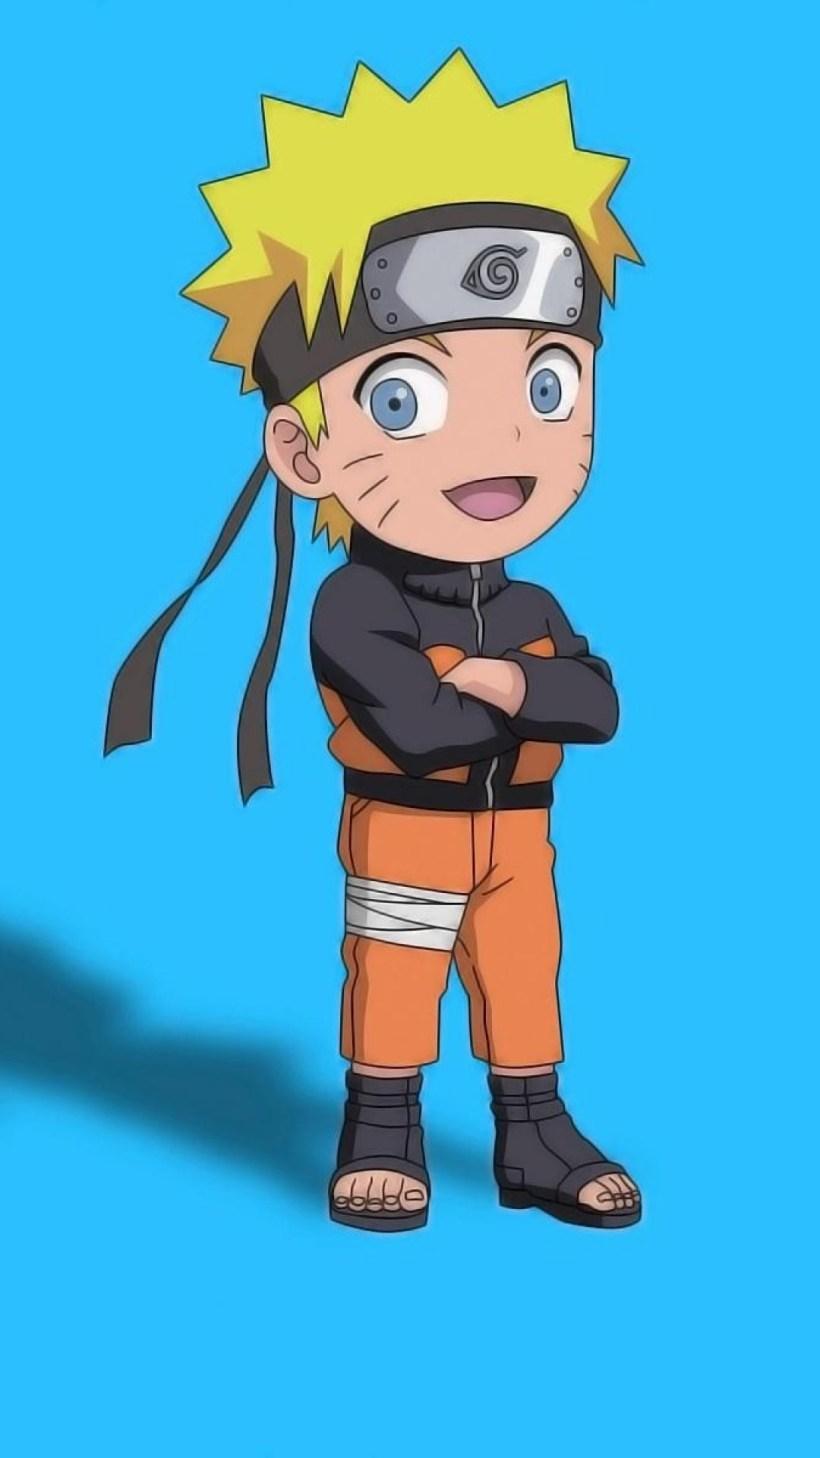 Download 77+ Wallpaper Animasi Naruto Shippuden Bergerak HD Terbaru